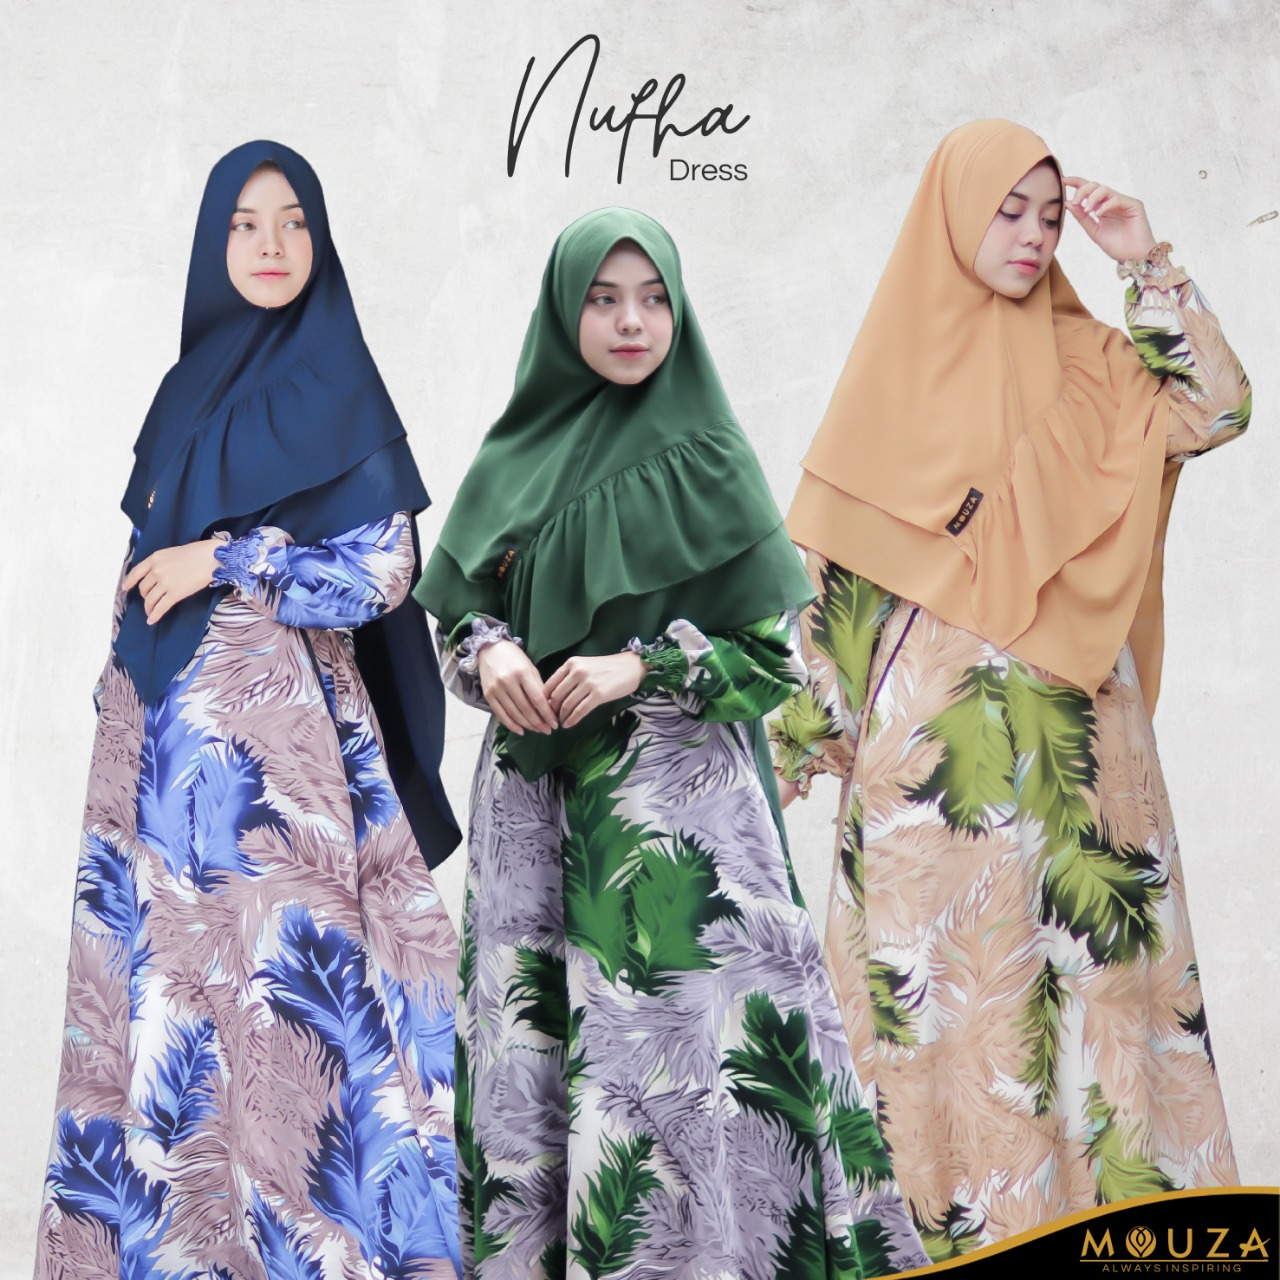 Nufha Dress